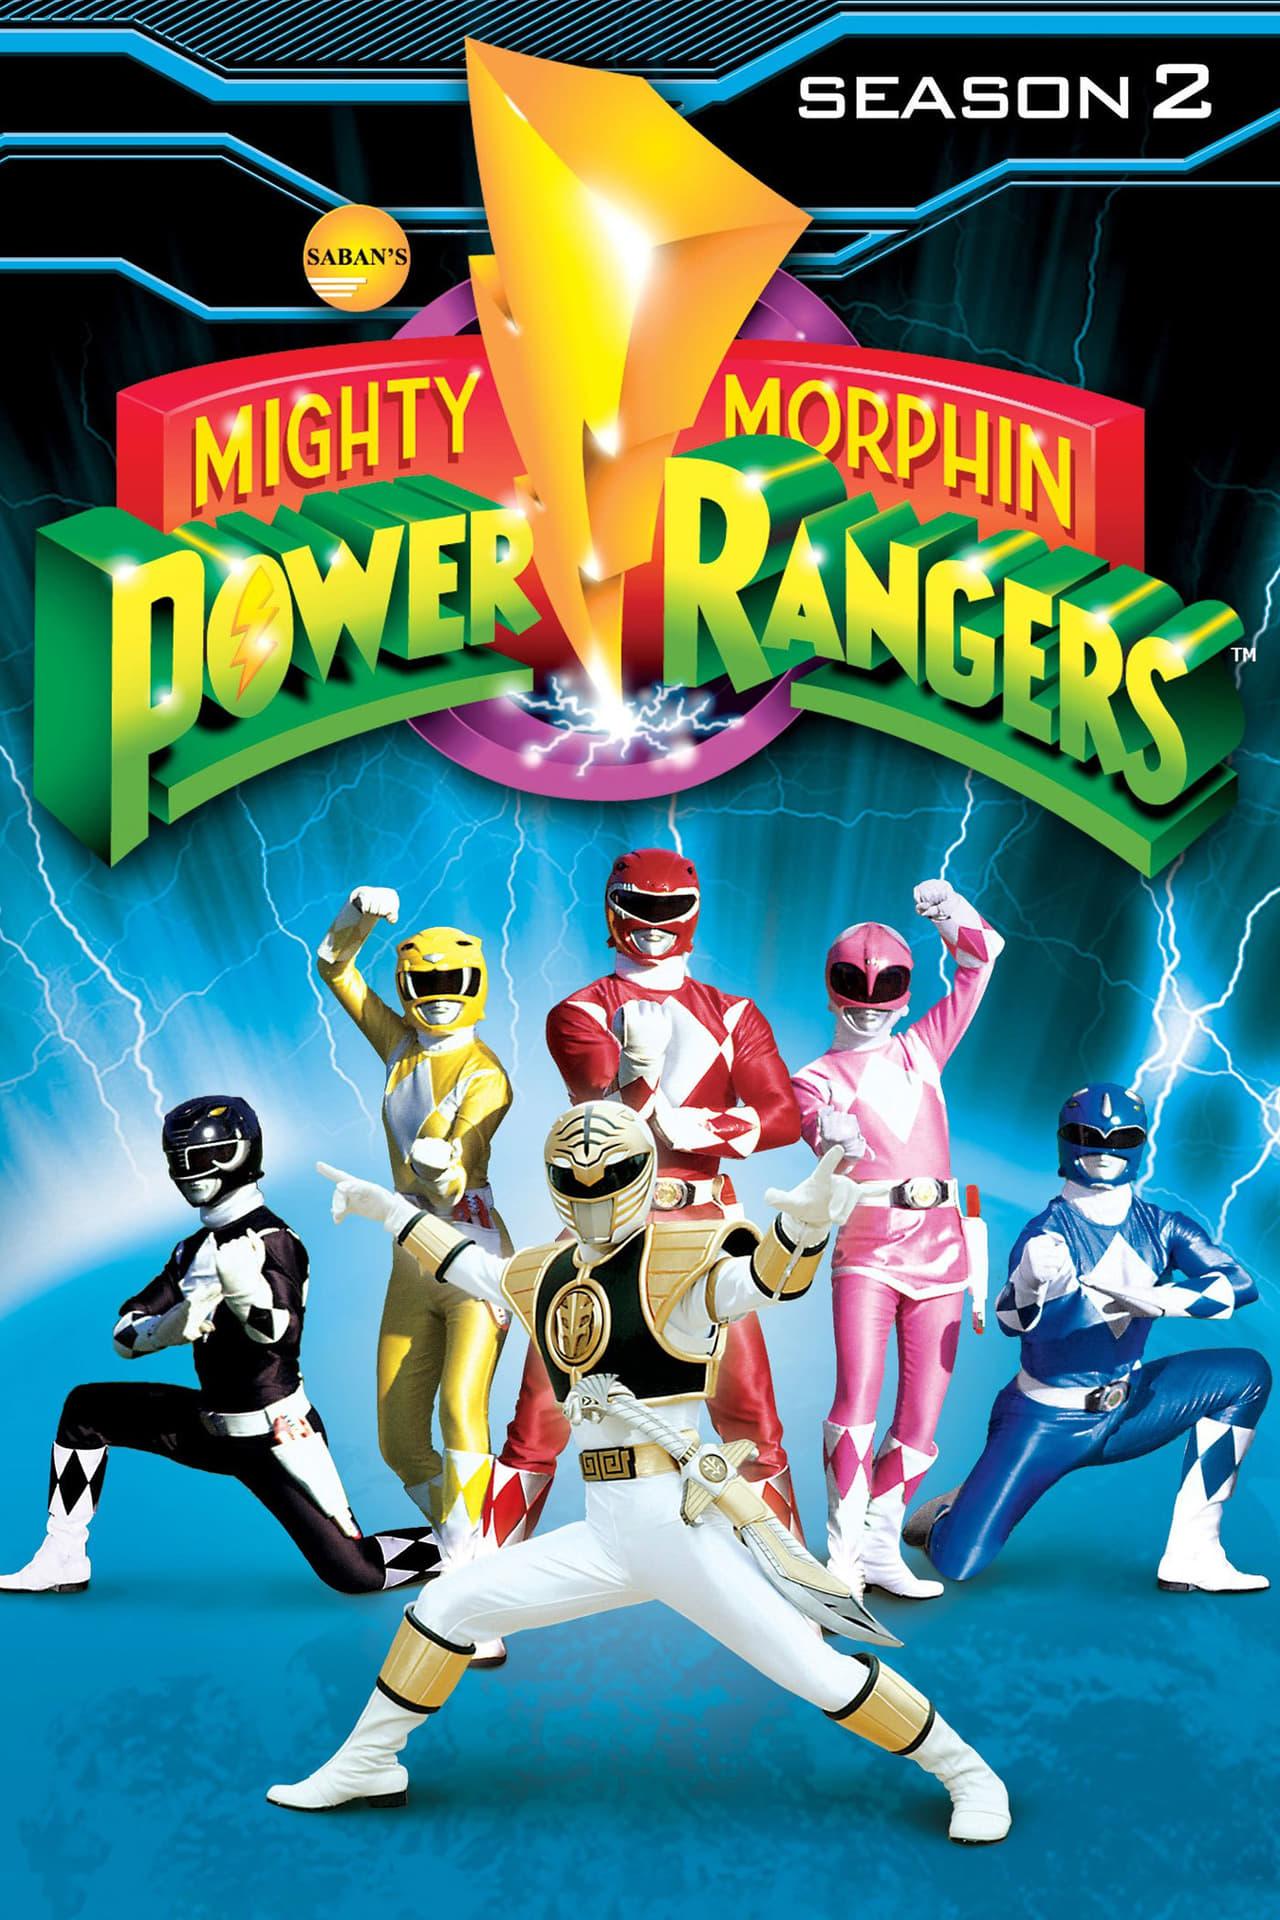 Power Rangers Season 2 (1994) putlockers cafe